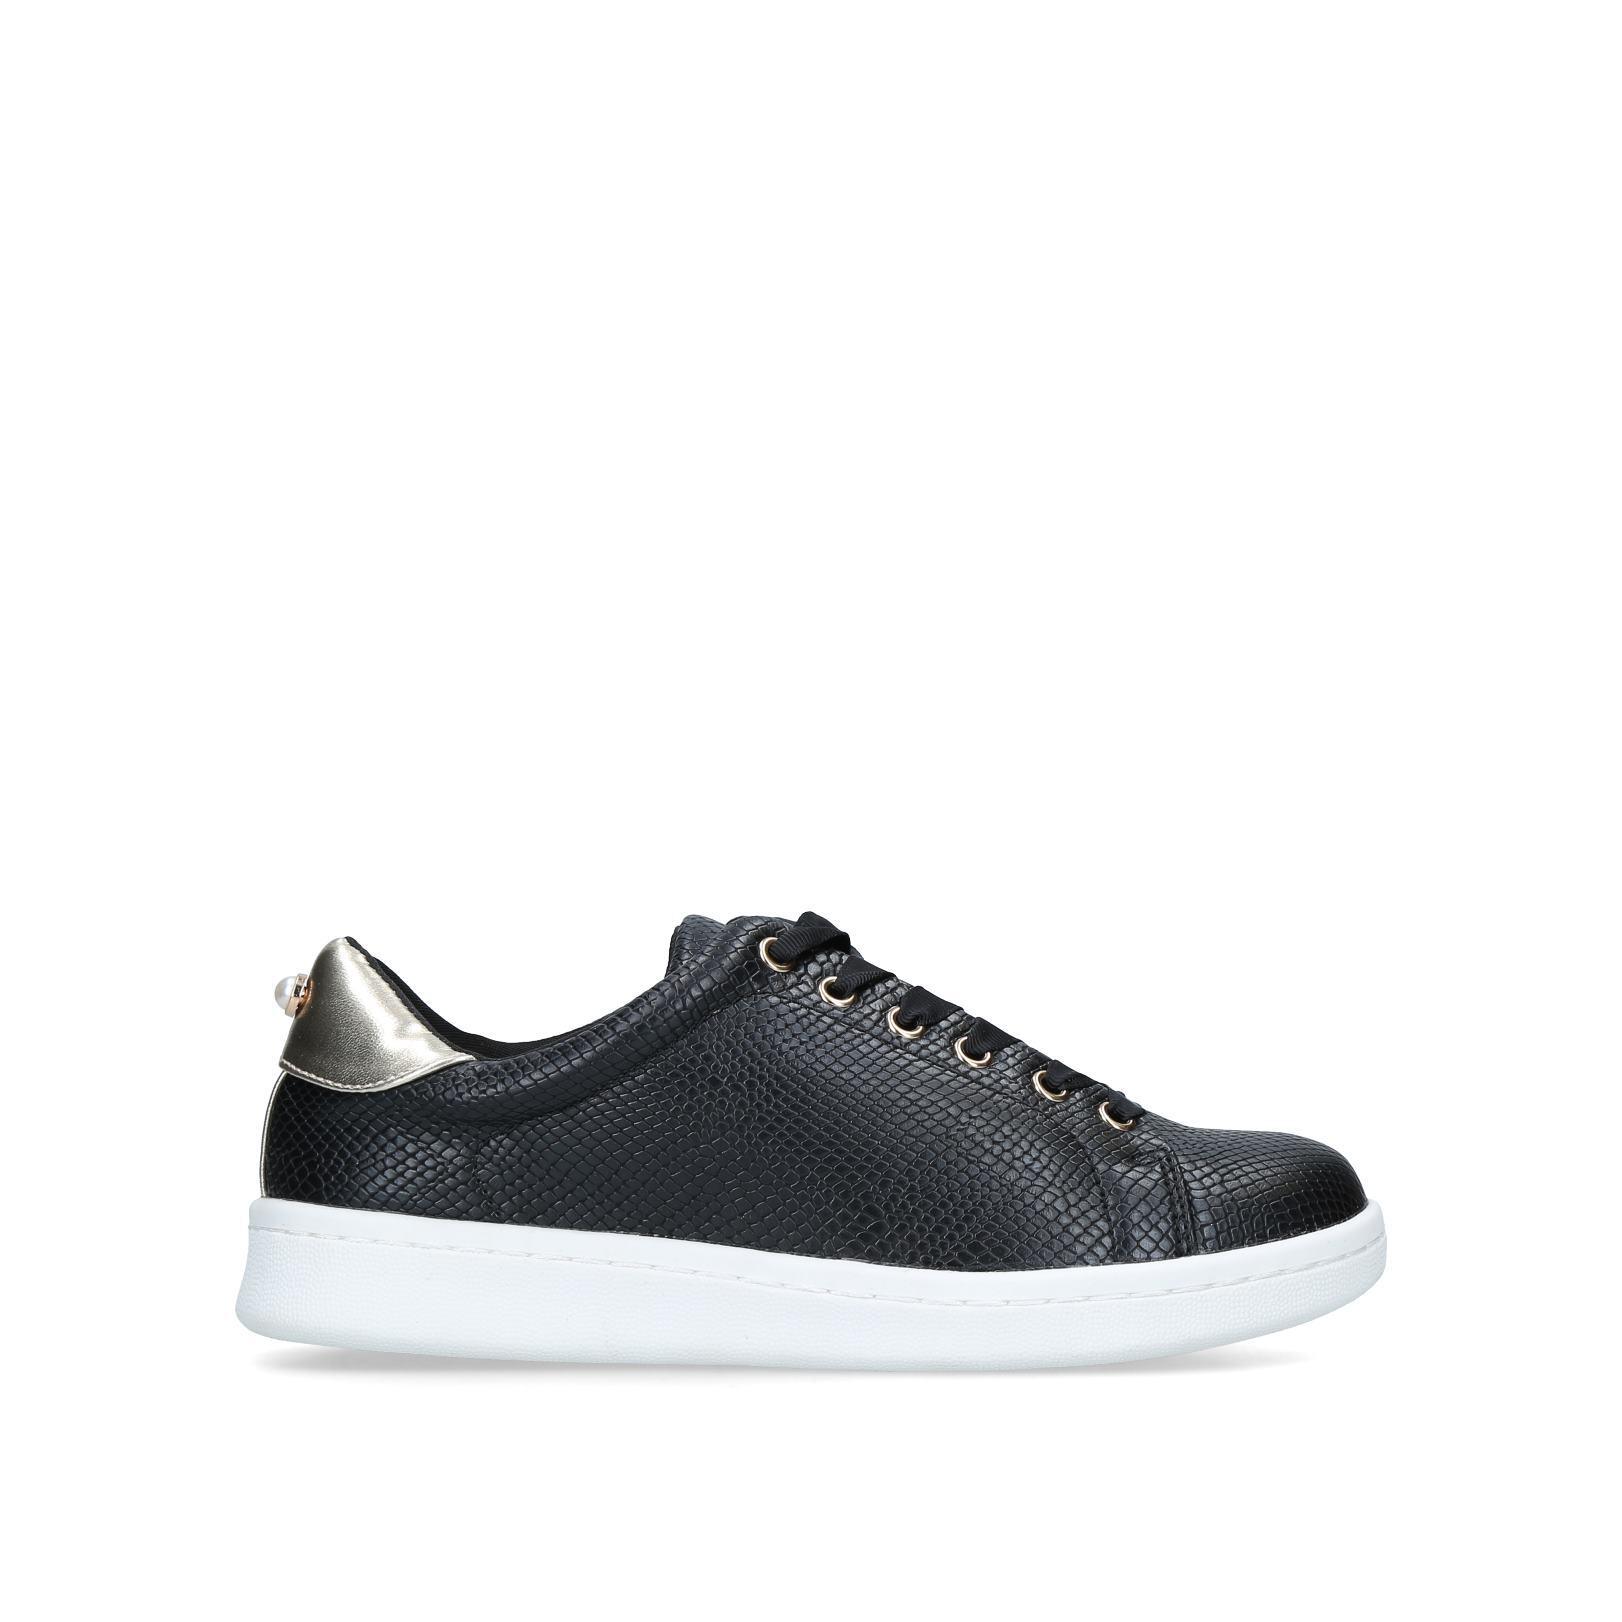 KORI - MISS KG Sneakers